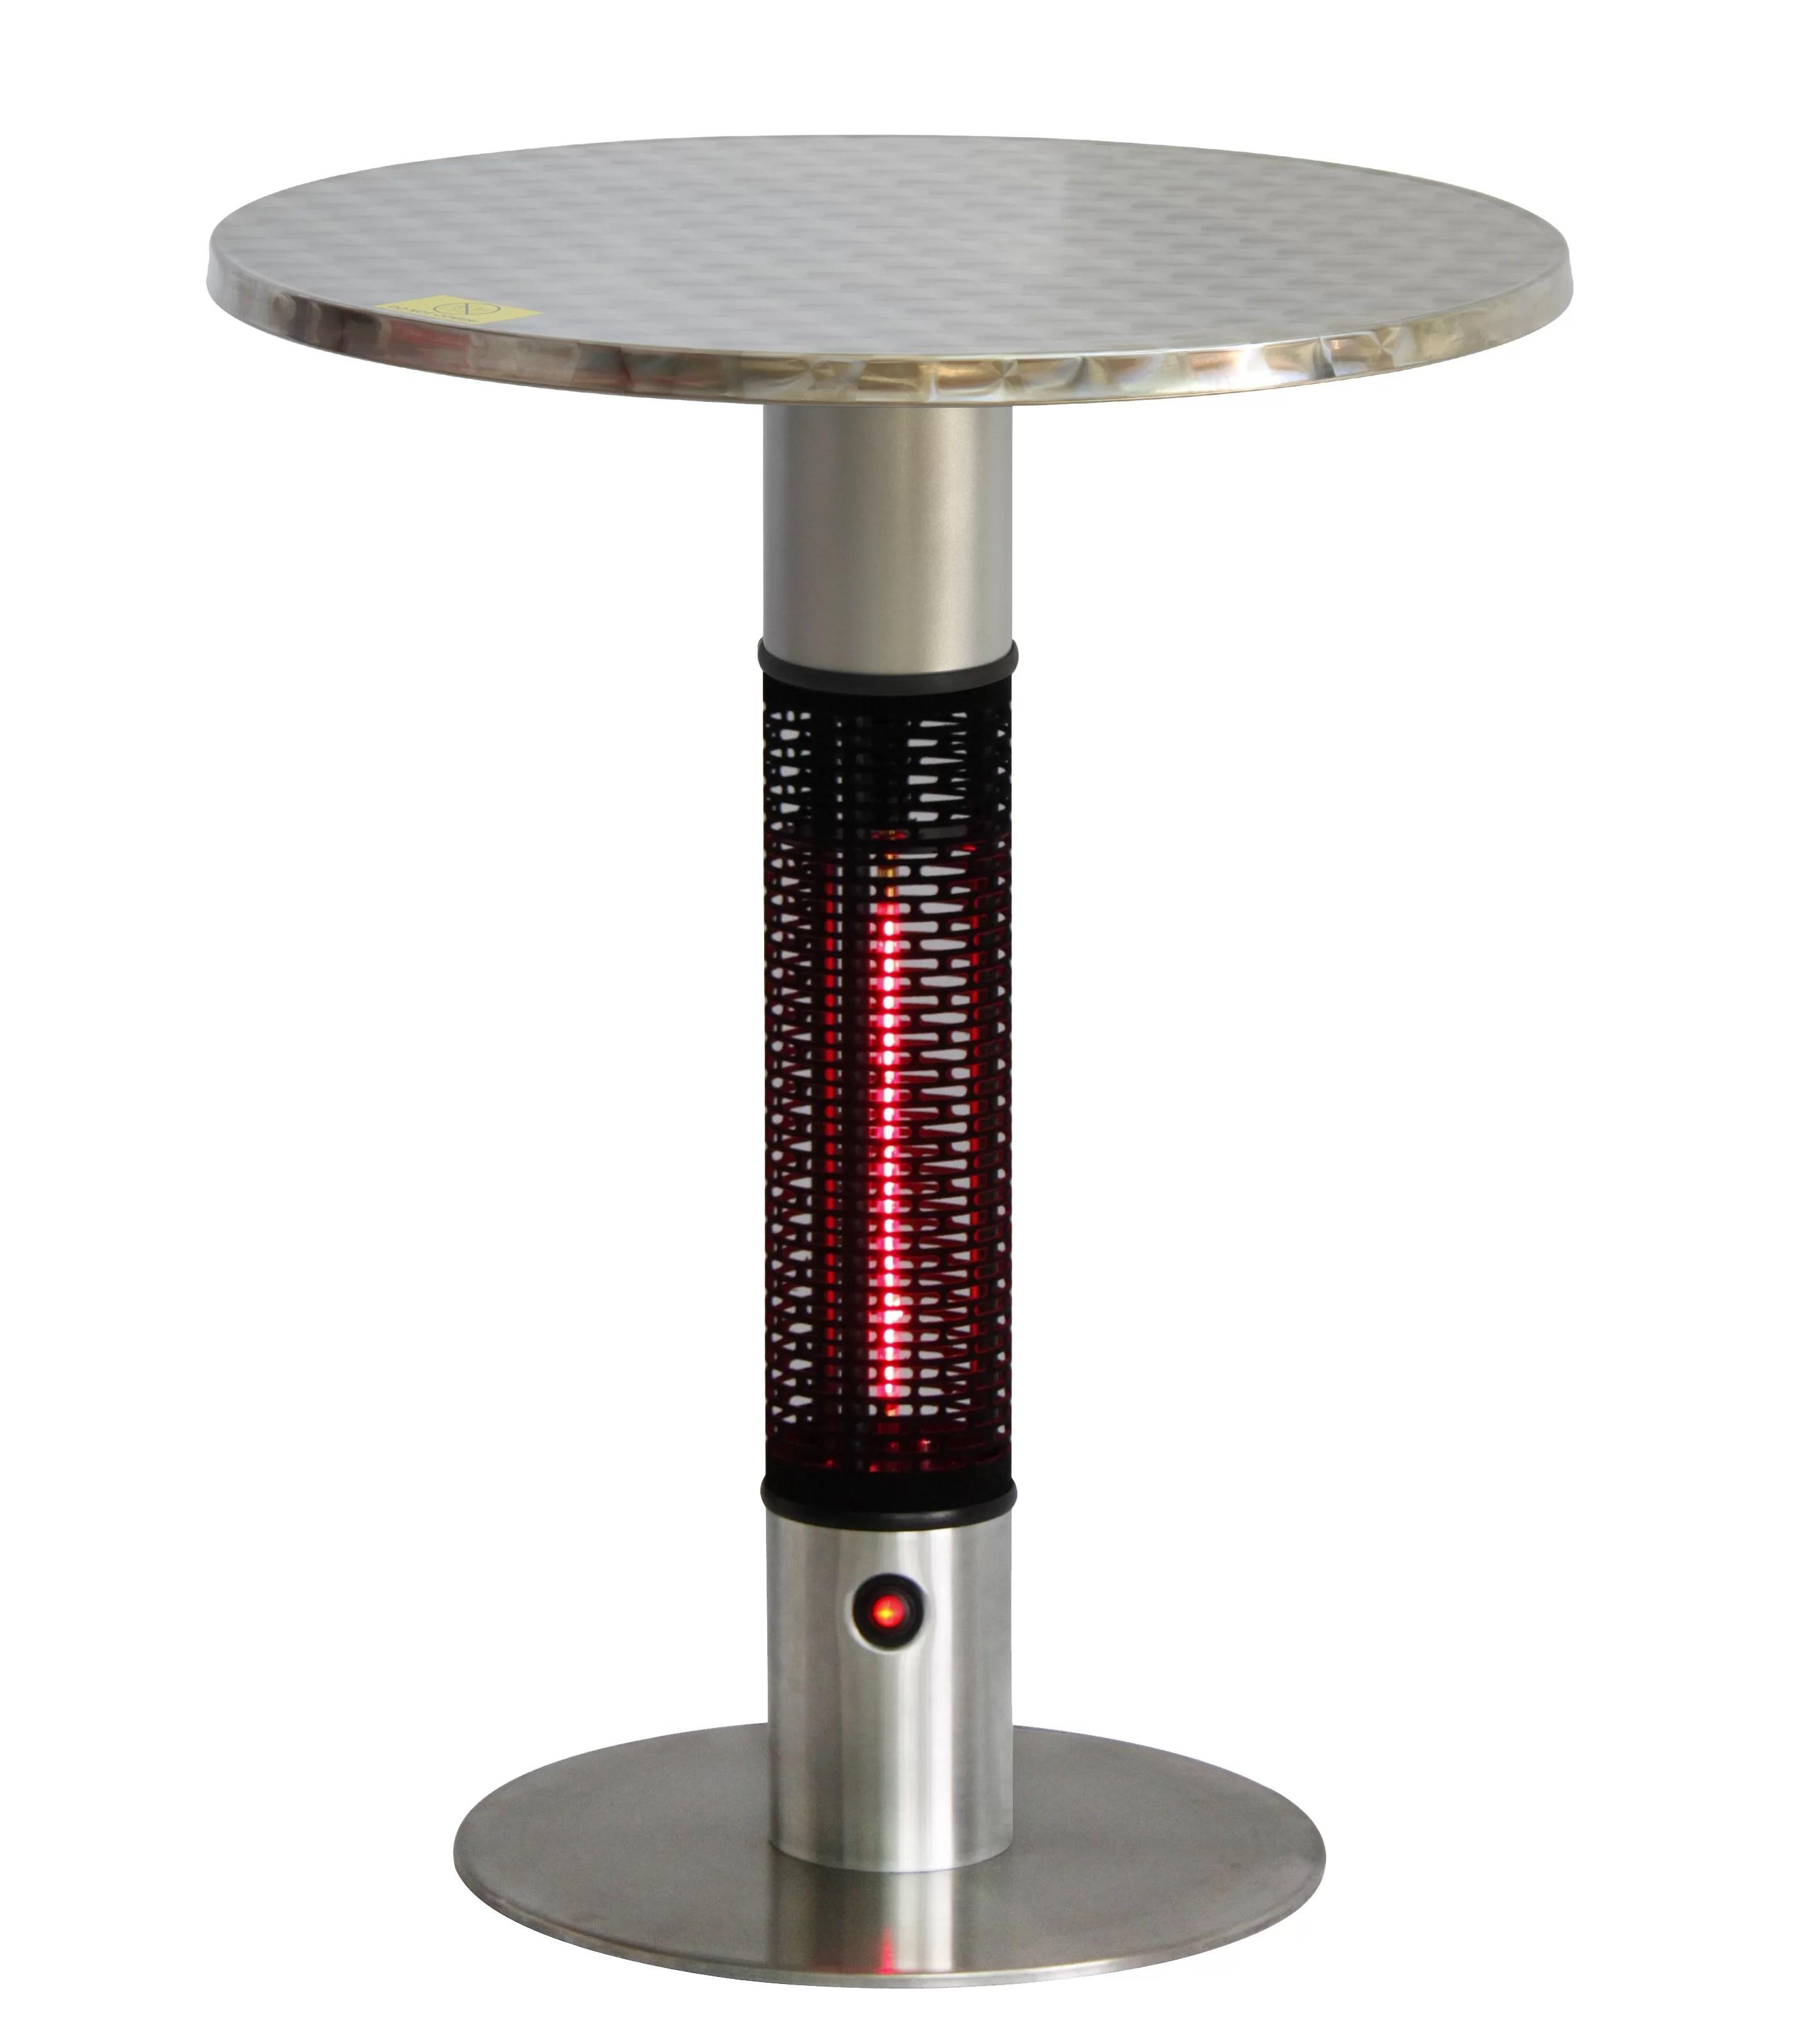 infrared 1500 watt electric tabletop patio heater